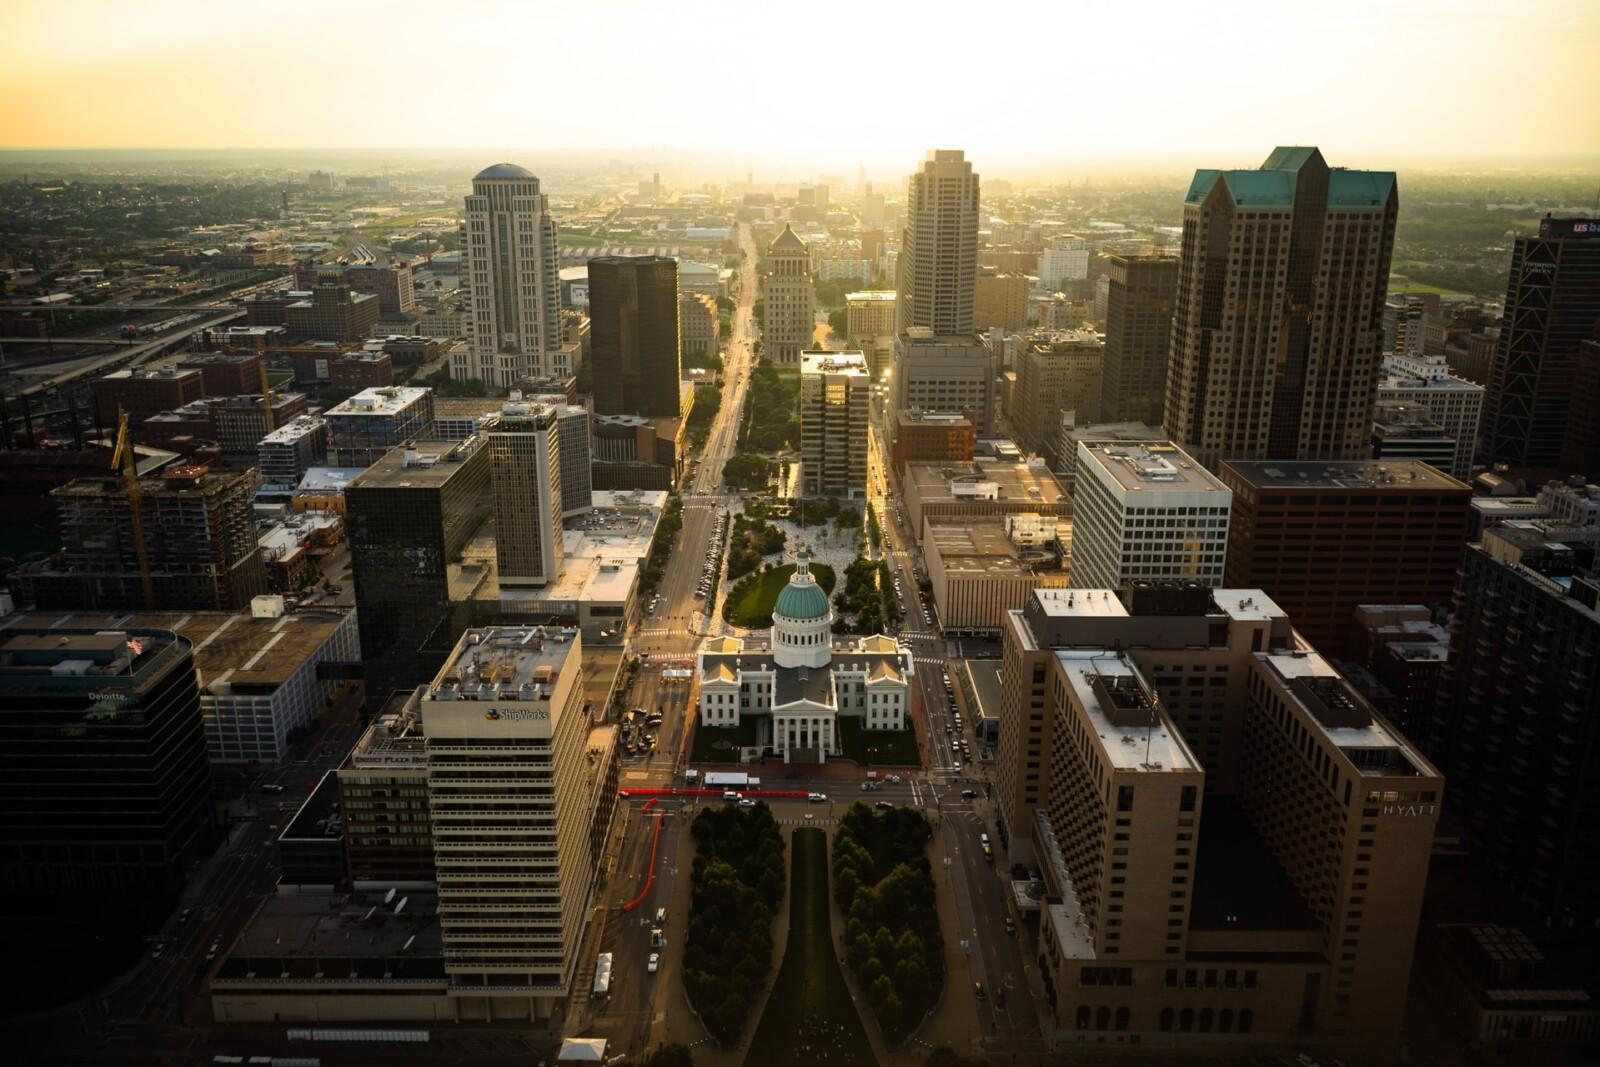 Las mejores zonas donde alojarse en St Louis, Misuri